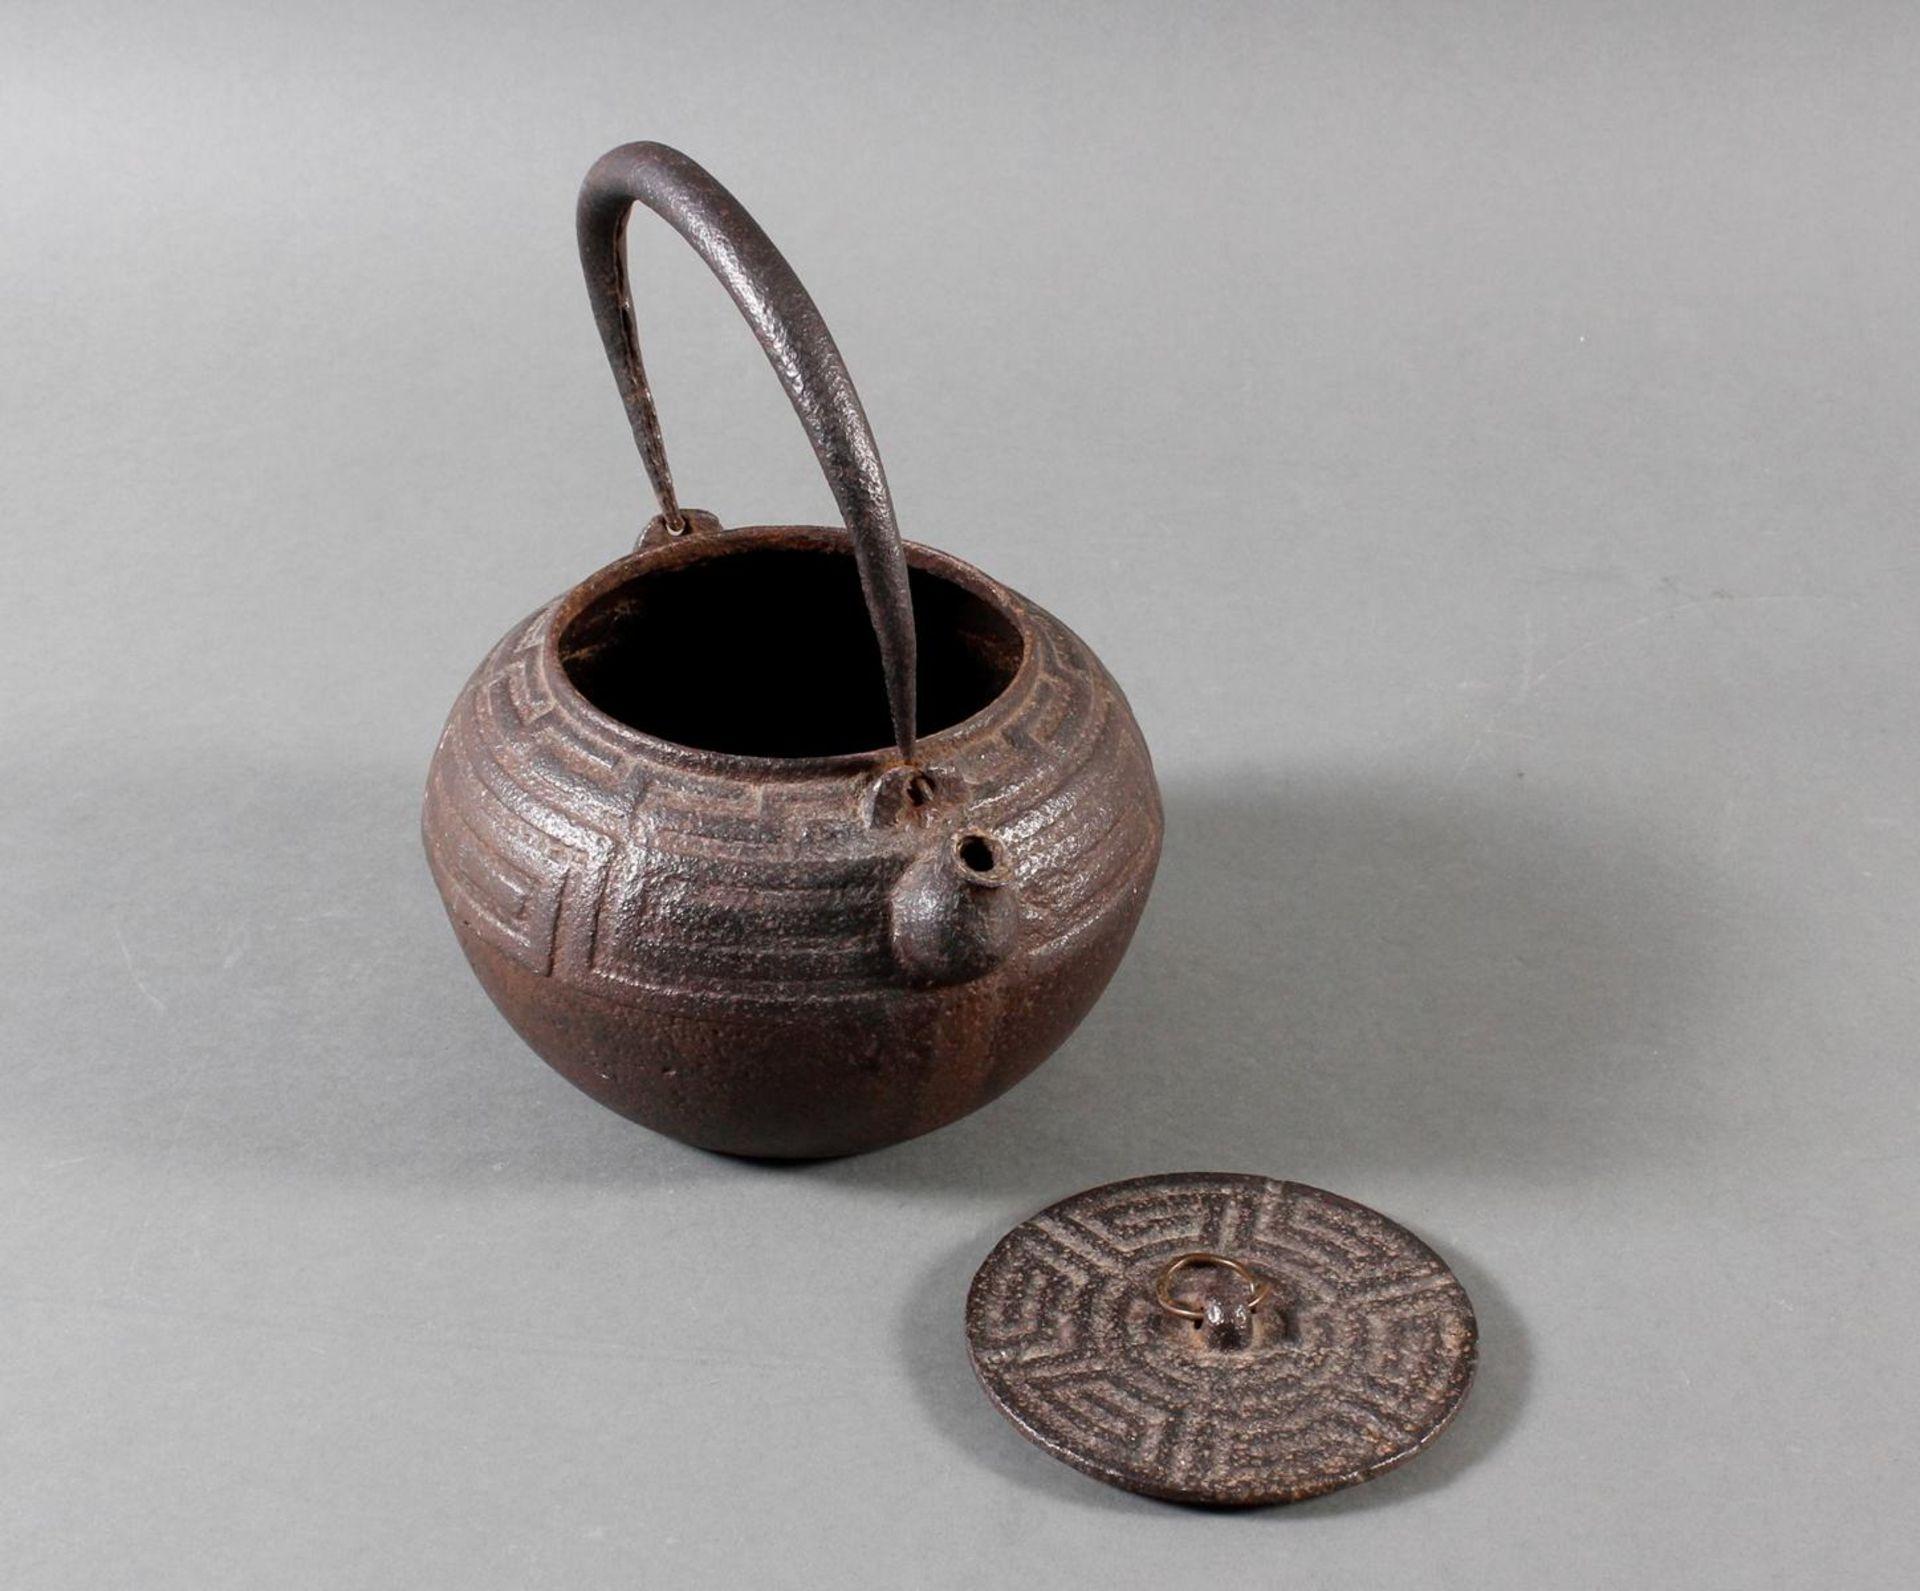 Gusseiserner Wasserkessel, China 18./19. Jahrhundert - Bild 4 aus 8